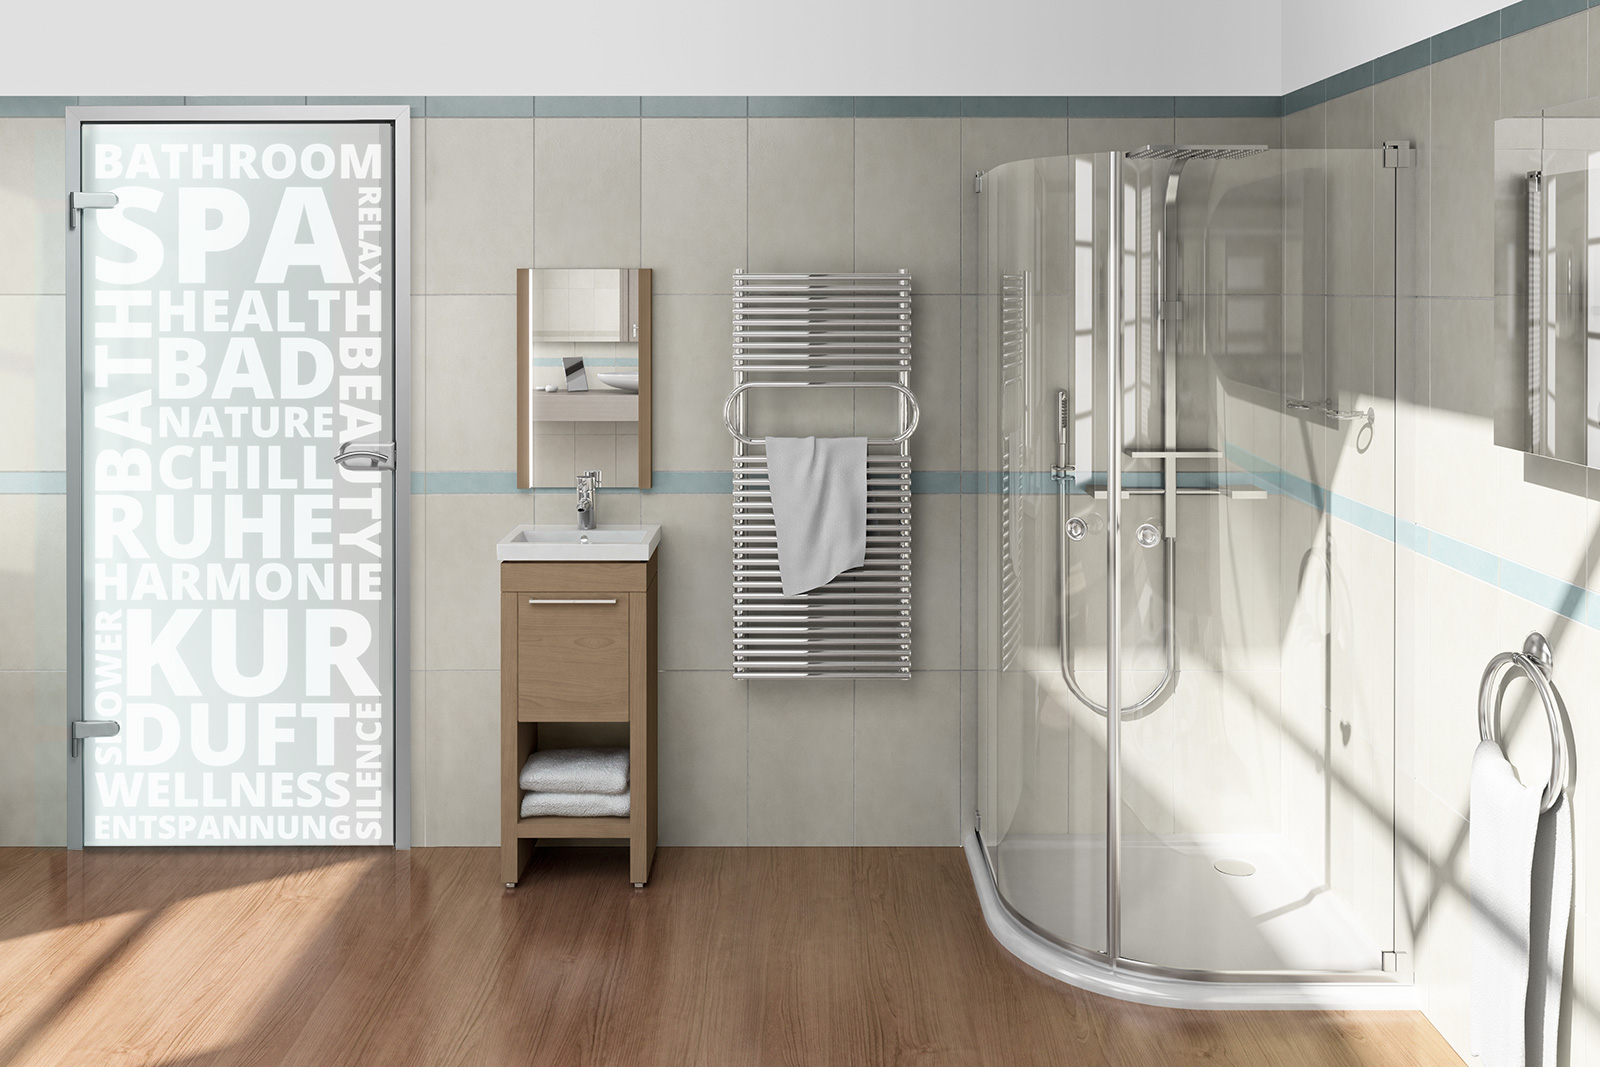 glast r badezimmer blickdicht badezimmer seite 2. Black Bedroom Furniture Sets. Home Design Ideas